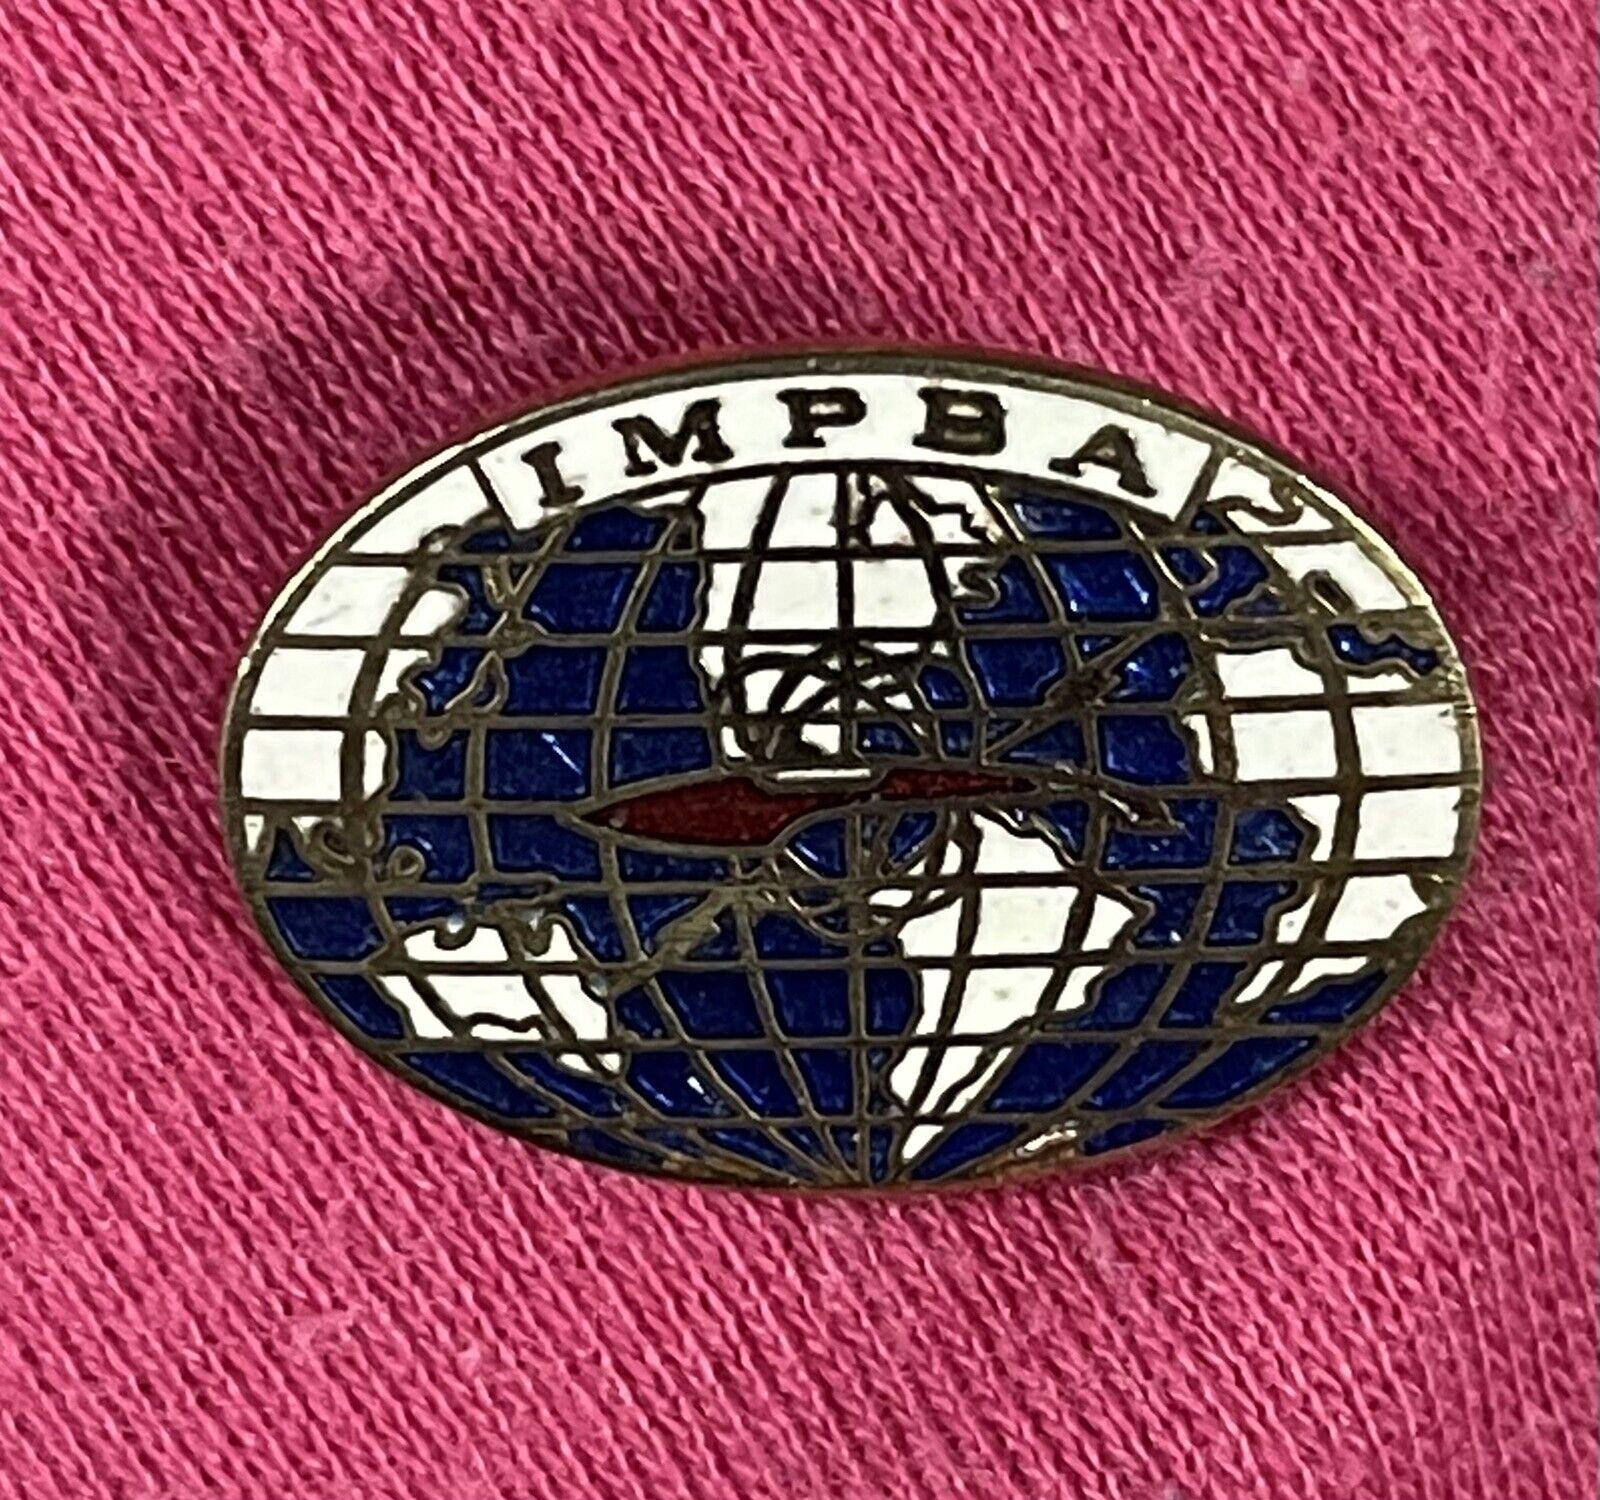 IMPBA PIN VINTAGE 1979 I.M.P.B.A. INTERNATIONAL MODEL POWER BOAT ASSOC.